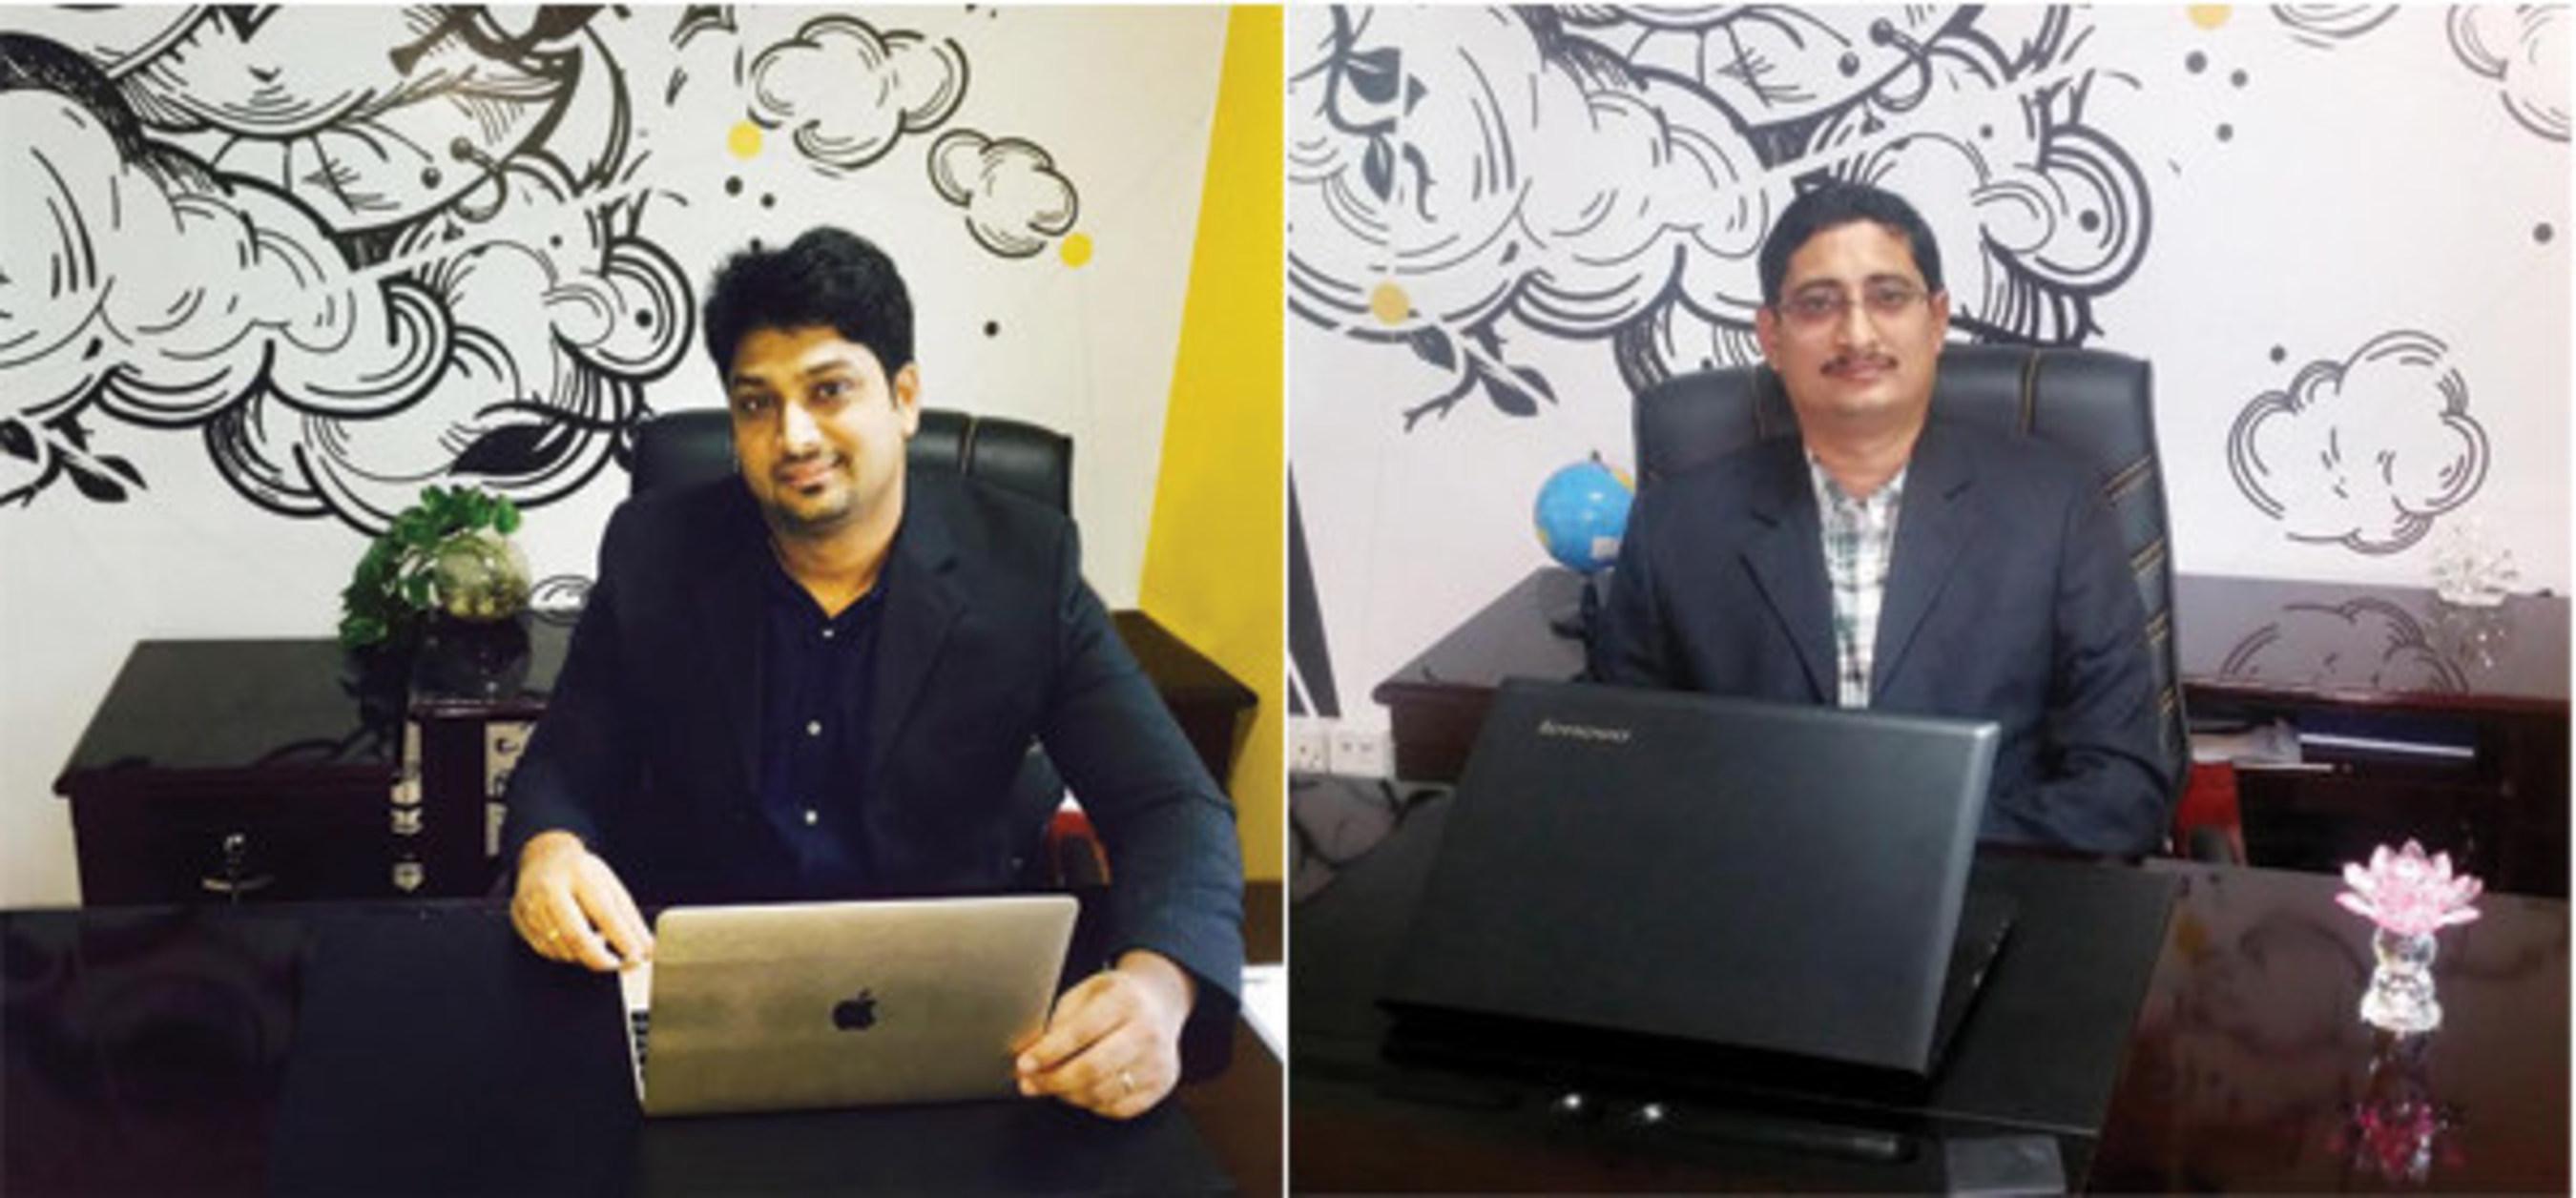 Mr. Shashank Panchmukh and Mr. Praveen Chandrasekharan (PRNewsFoto/Menakart)